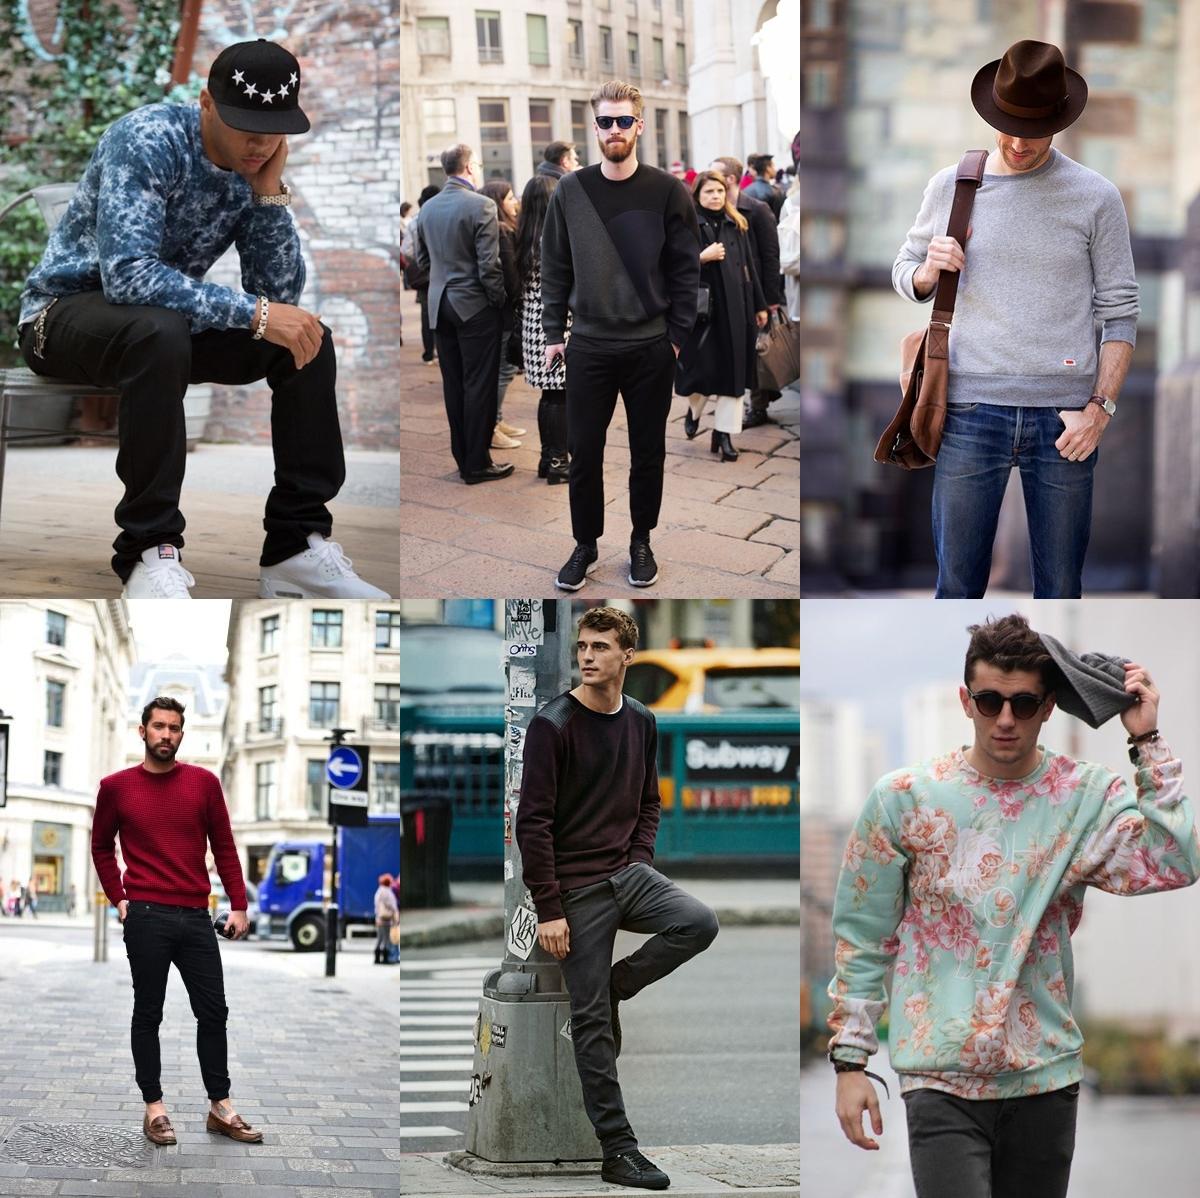 Moletom Tend Ncia Masculina E Pe A De Estilo Moda Sem Censura Blog De Moda Masculina